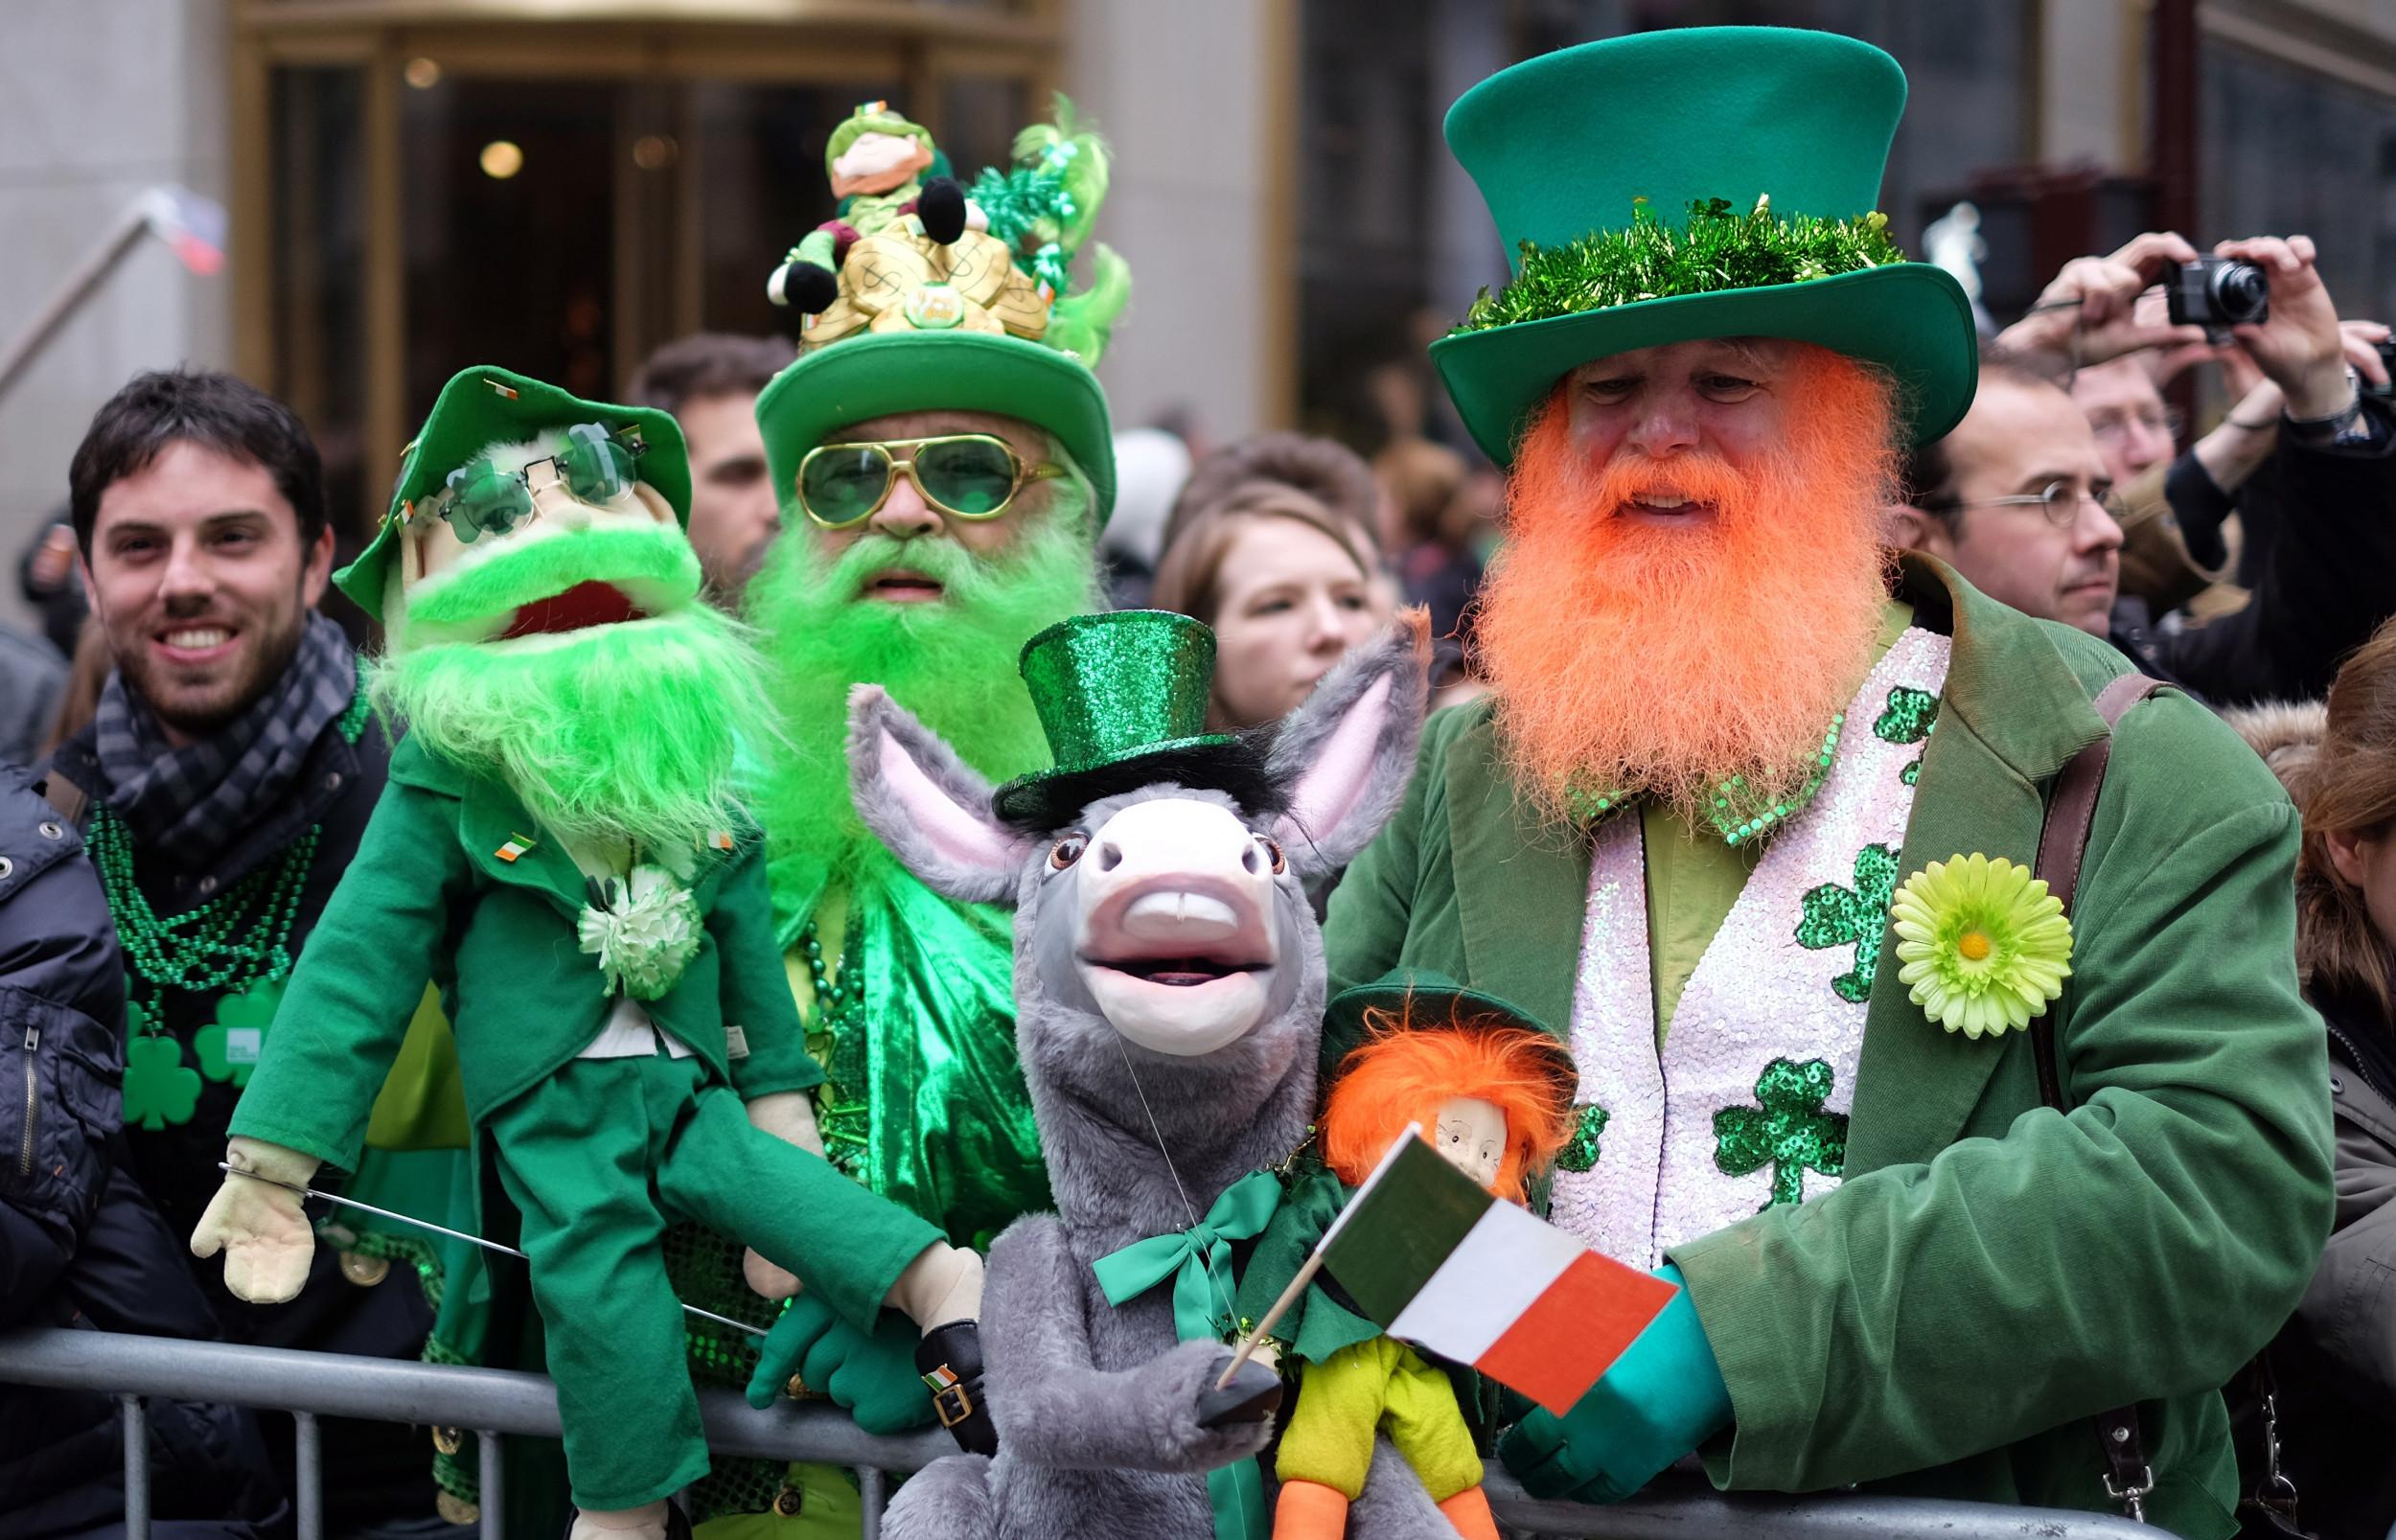 Novelty Waistcoat Happy St Patricks Day Shamrock Leprechaun Funny Party Festival